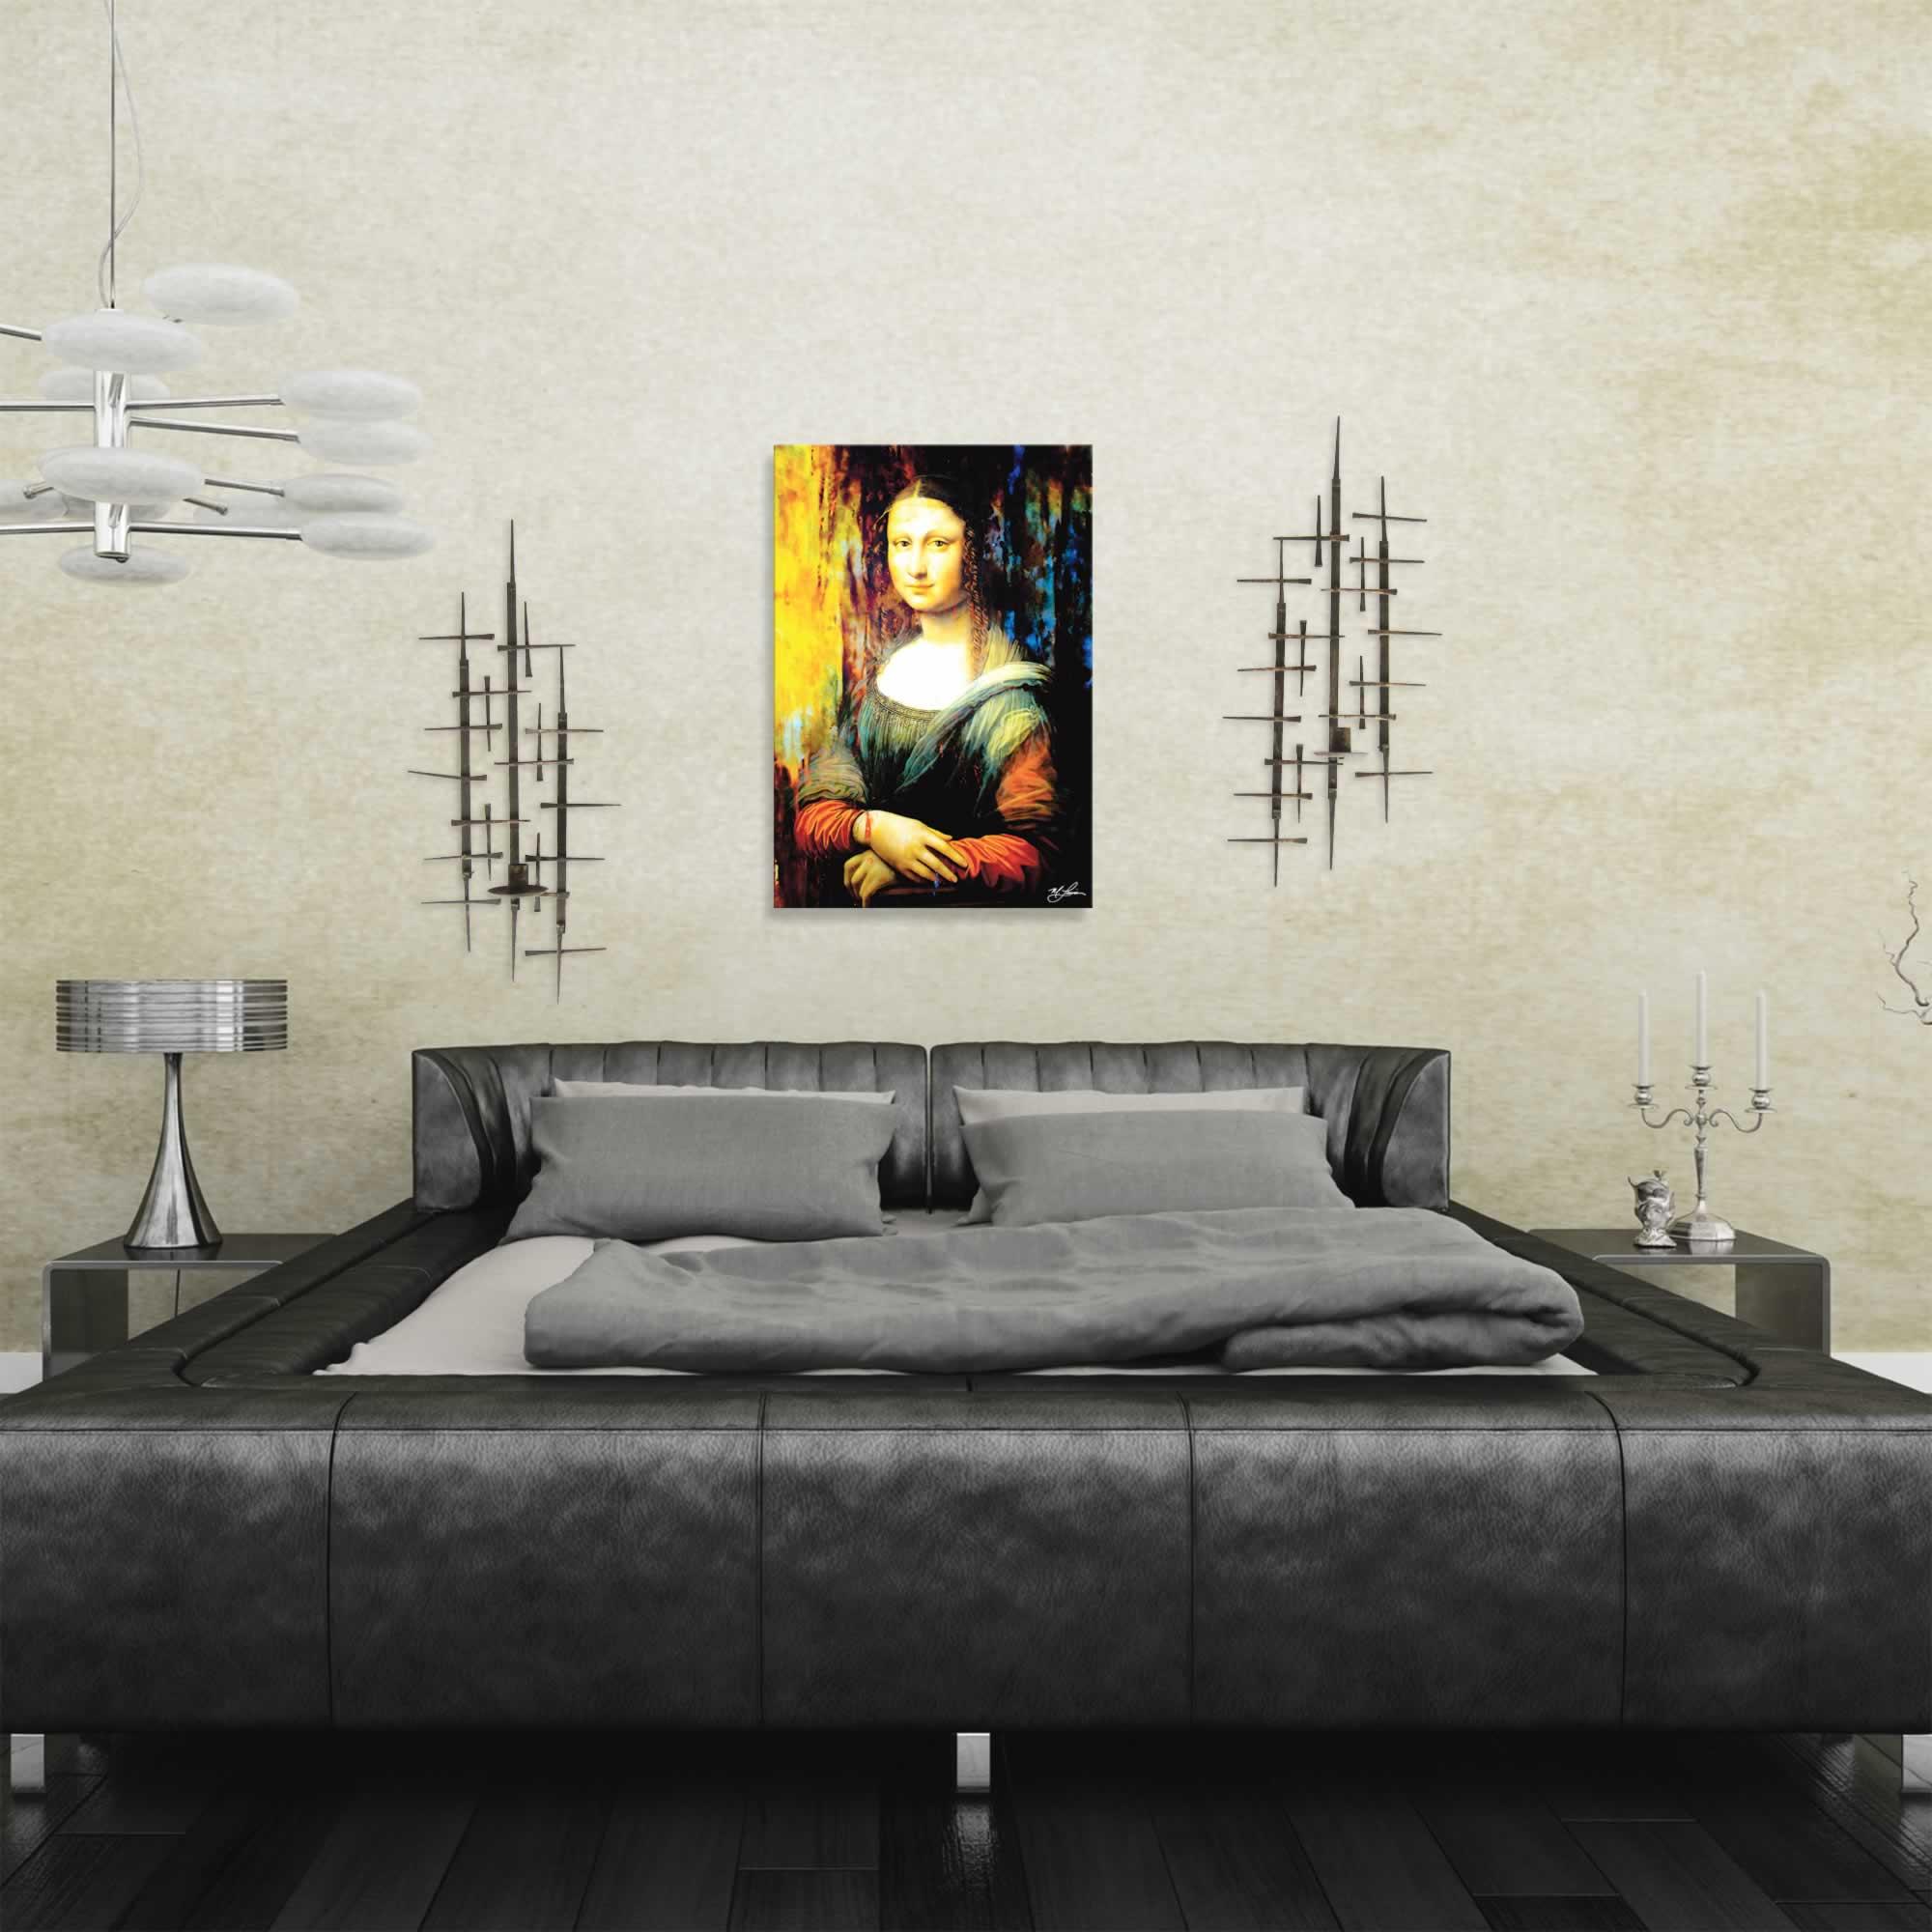 Mark Lewis 'Mona Lisa Ageless Charm' Limited Edition Pop Art Print on Metal or Acrylic - Alternate View 1